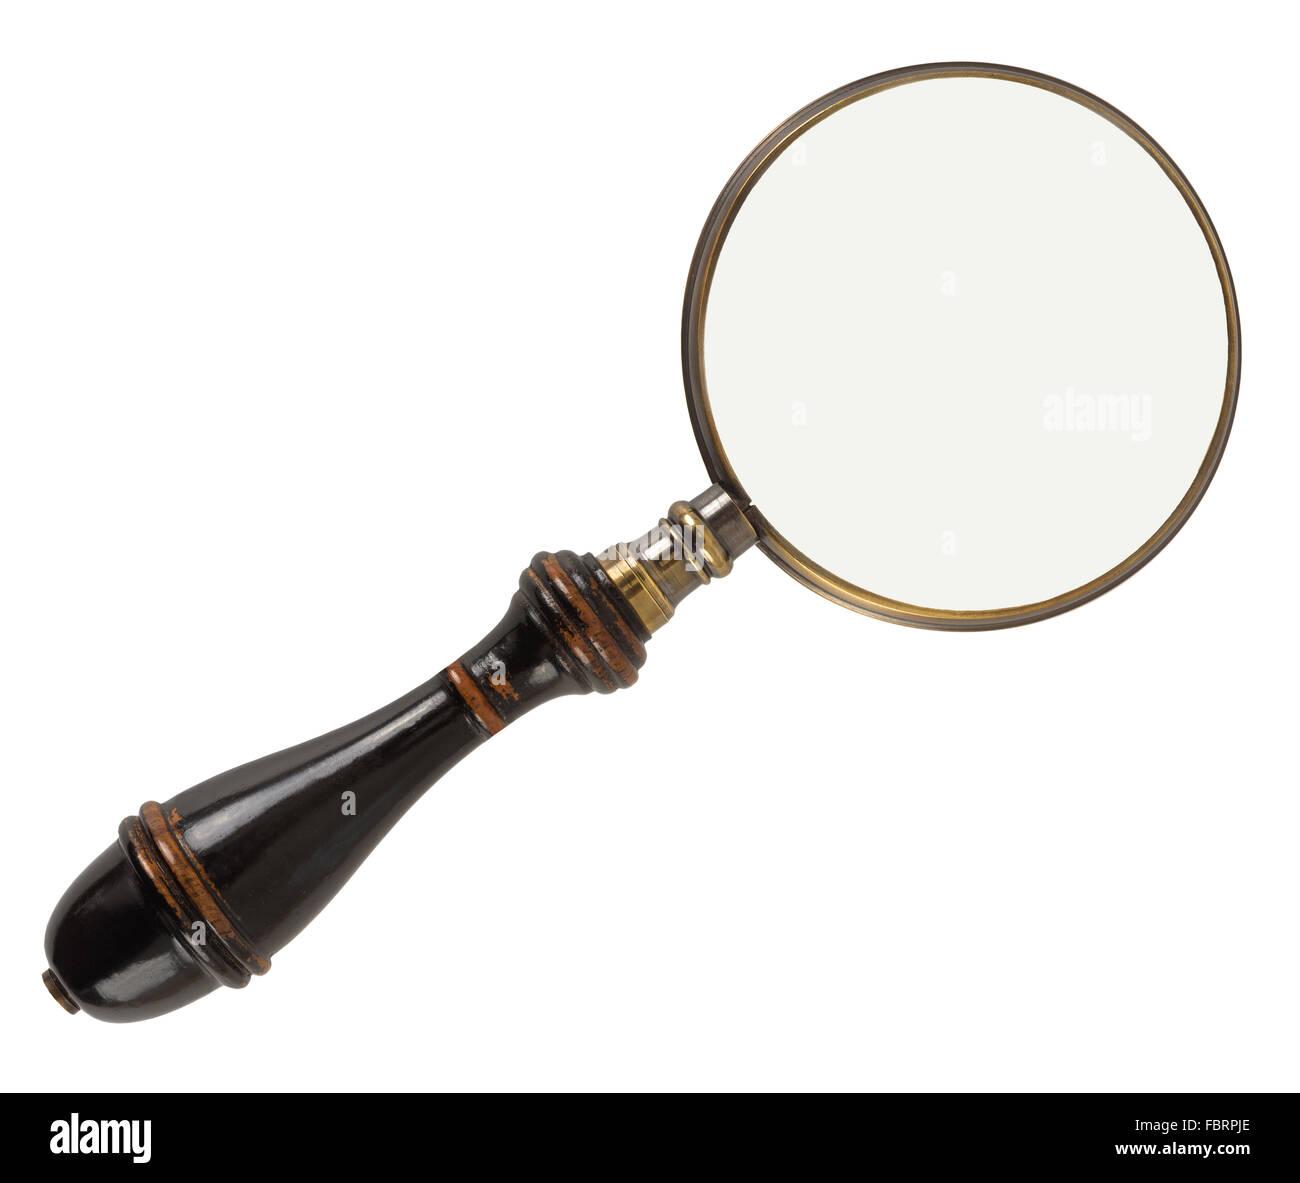 Vintage magnifying glass isolated on white background - Stock Image